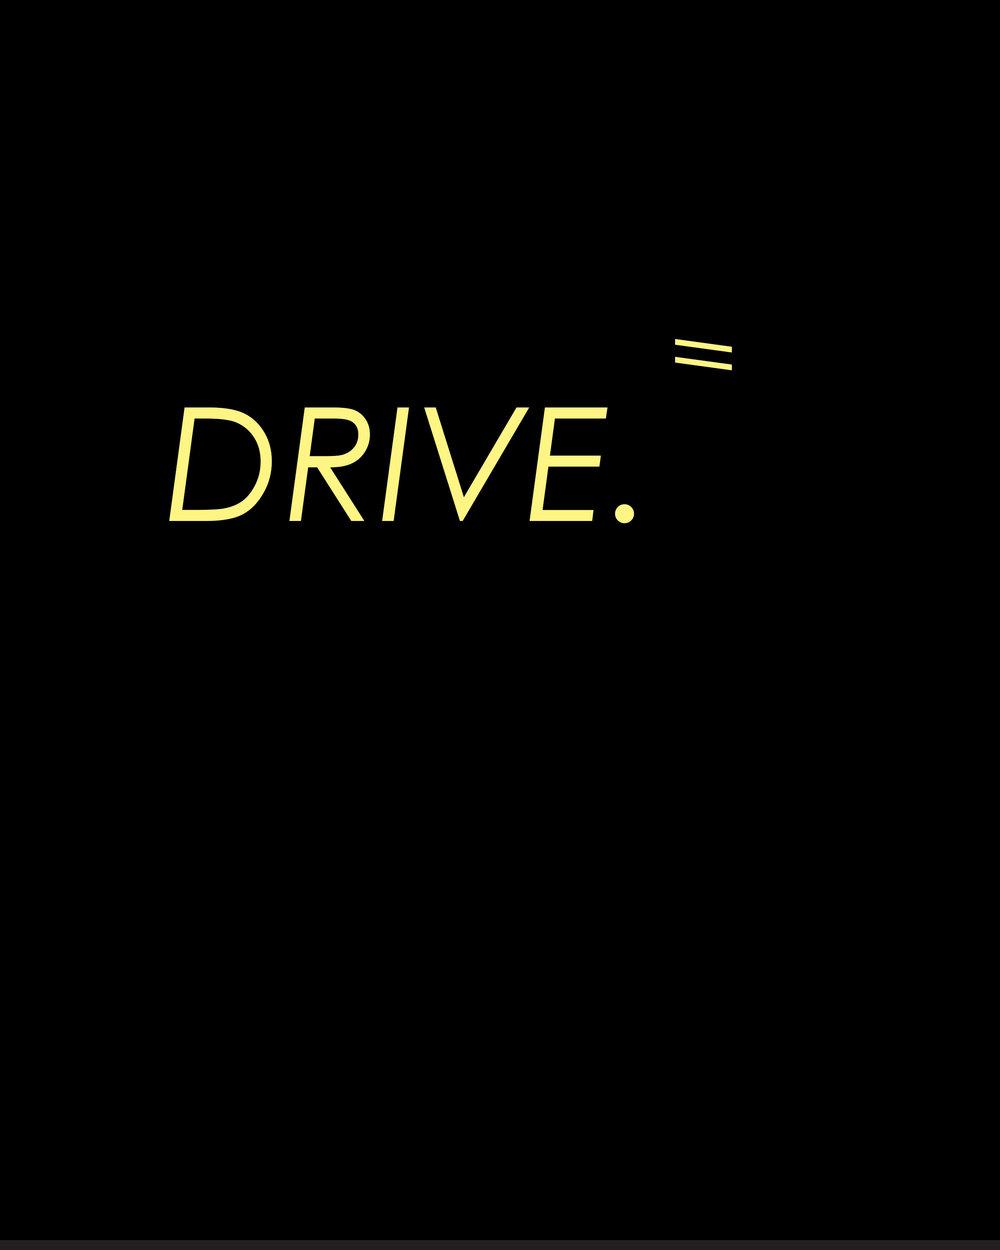 Drive Part II-1.jpg